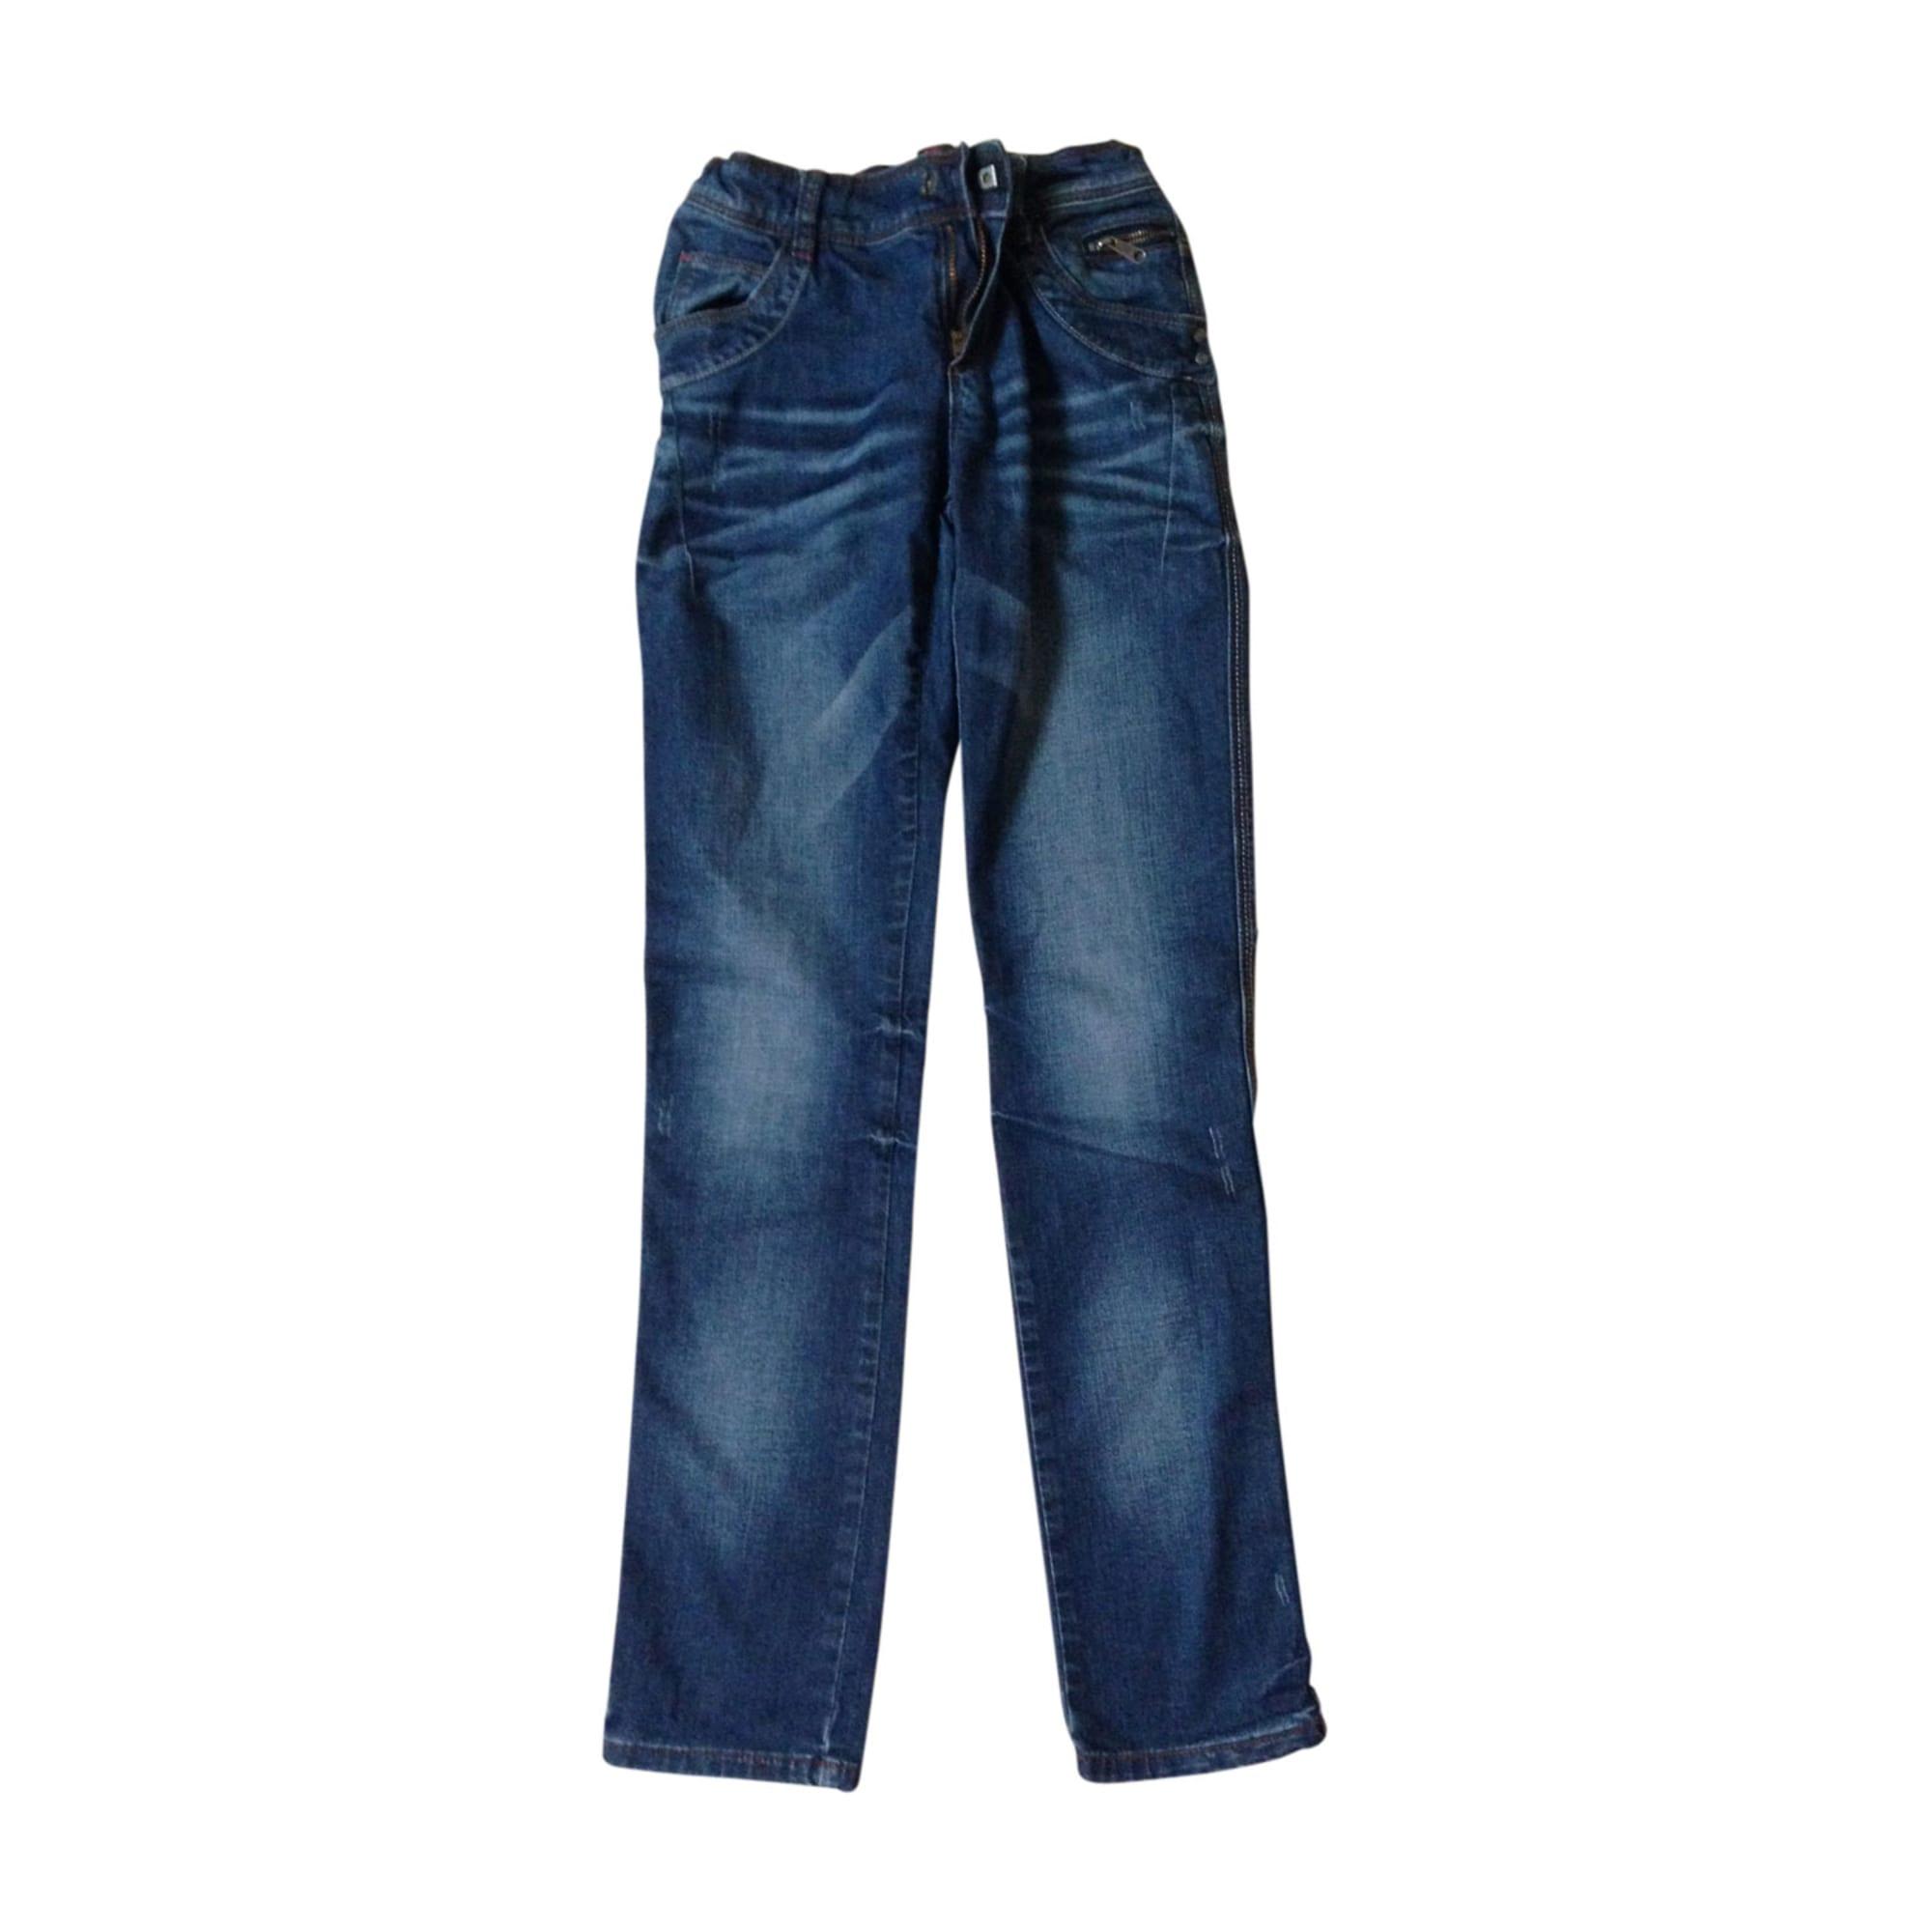 Jean slim  JEAN BOURGET Bleu, bleu marine, bleu turquoise